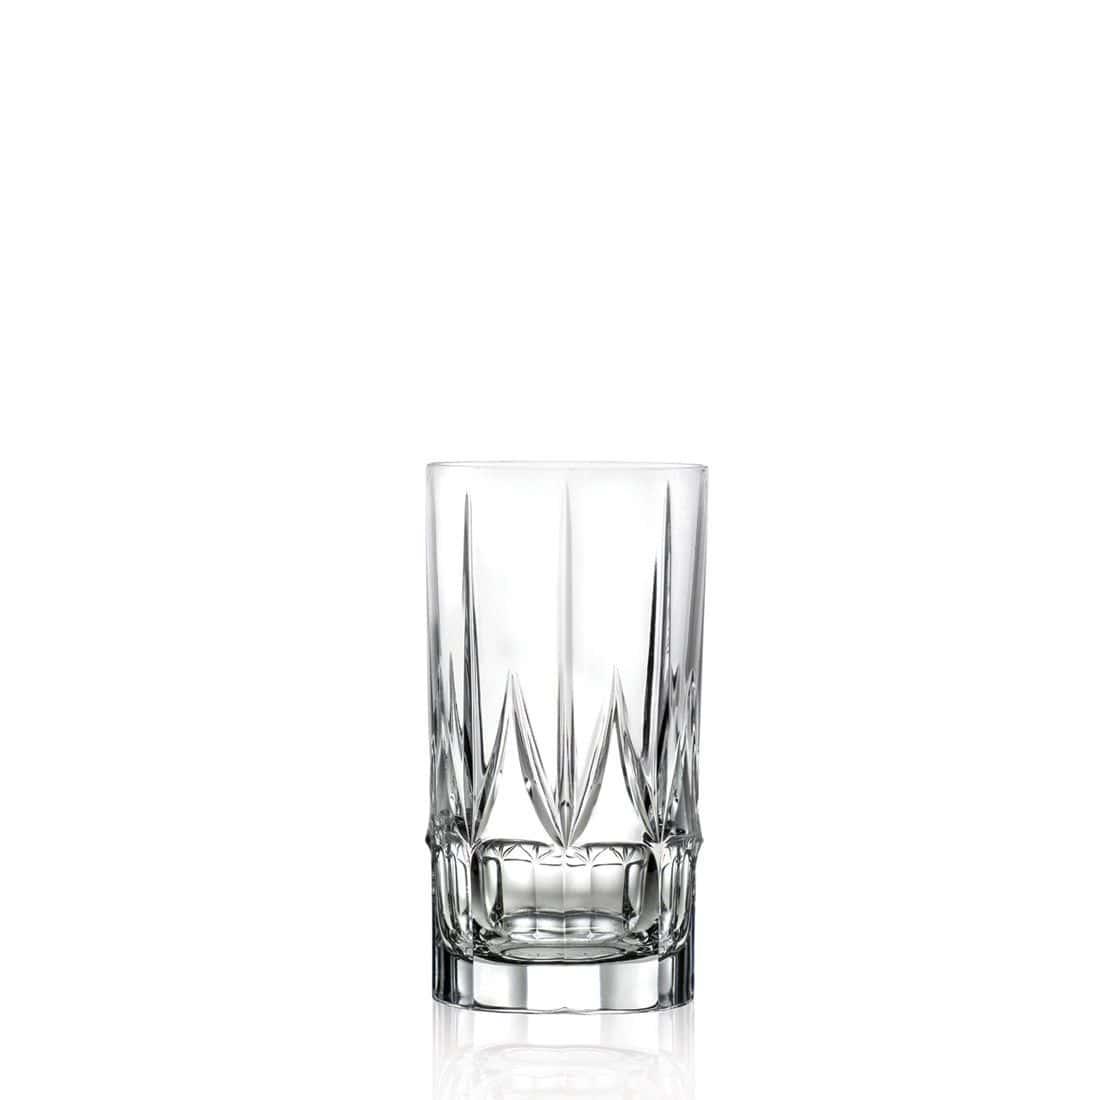 Набор стаканов для воды 520 мл Chic RCR